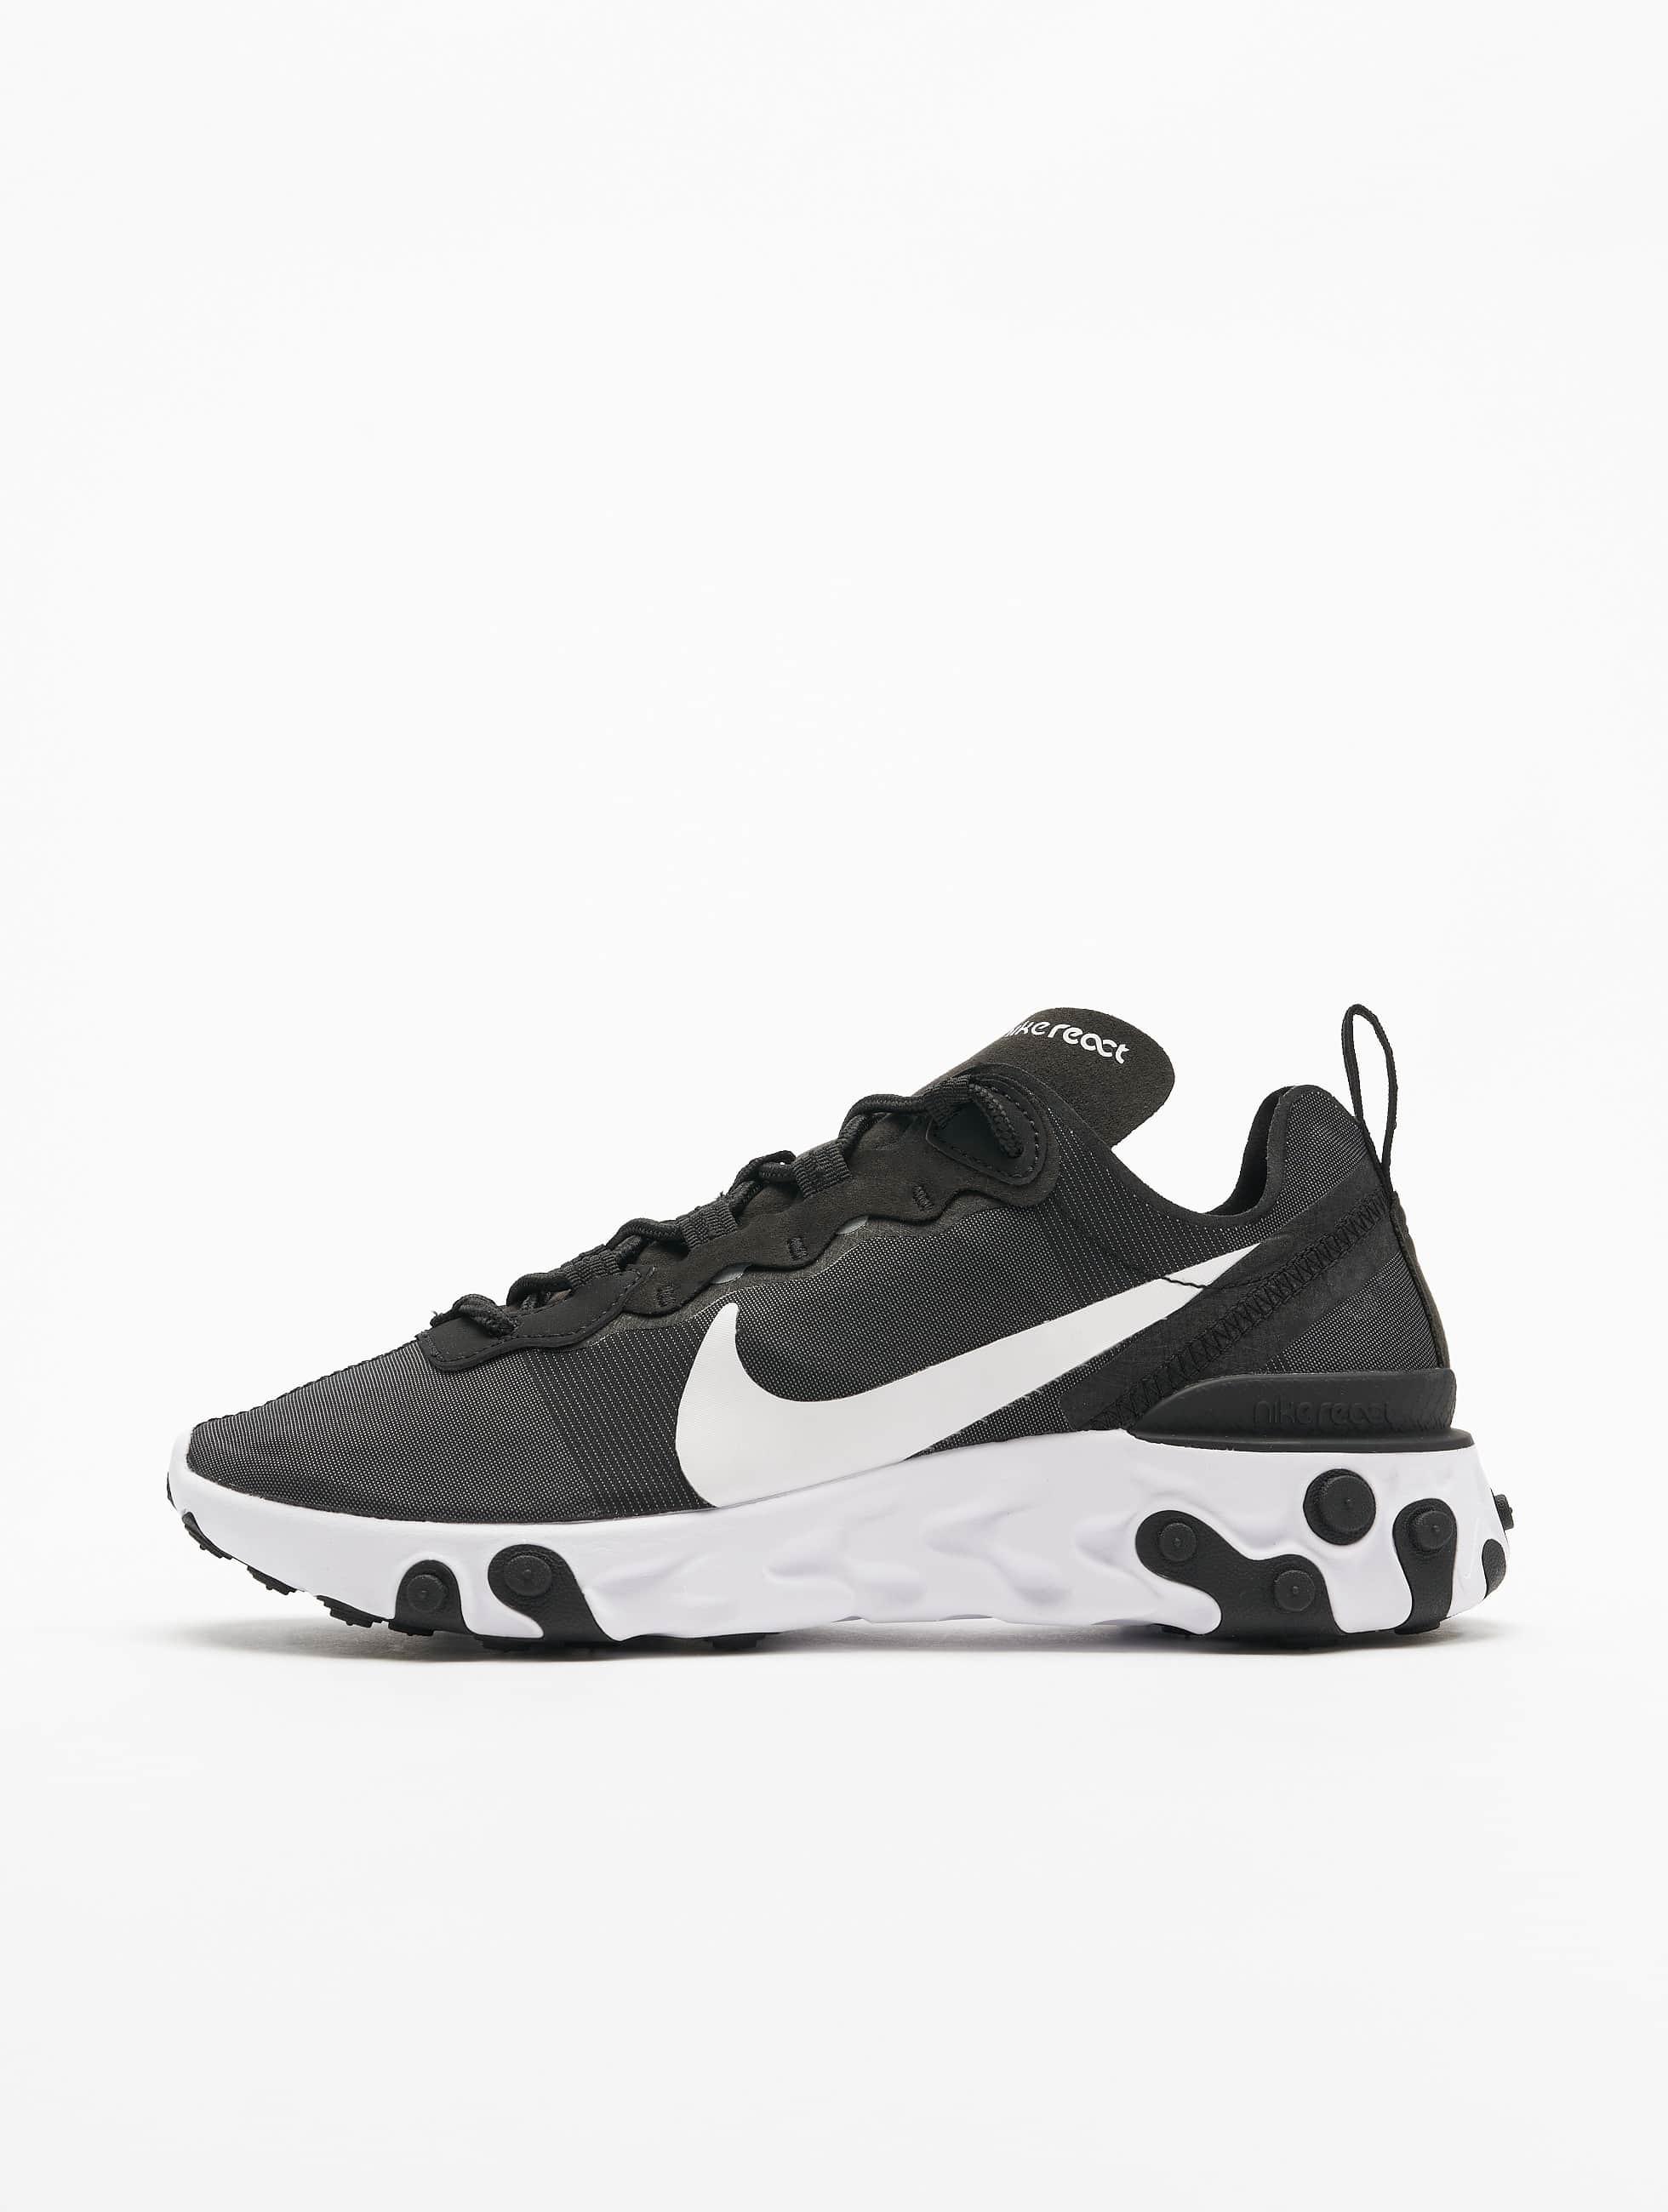 Nike React Element 55 Sneakers Black/White